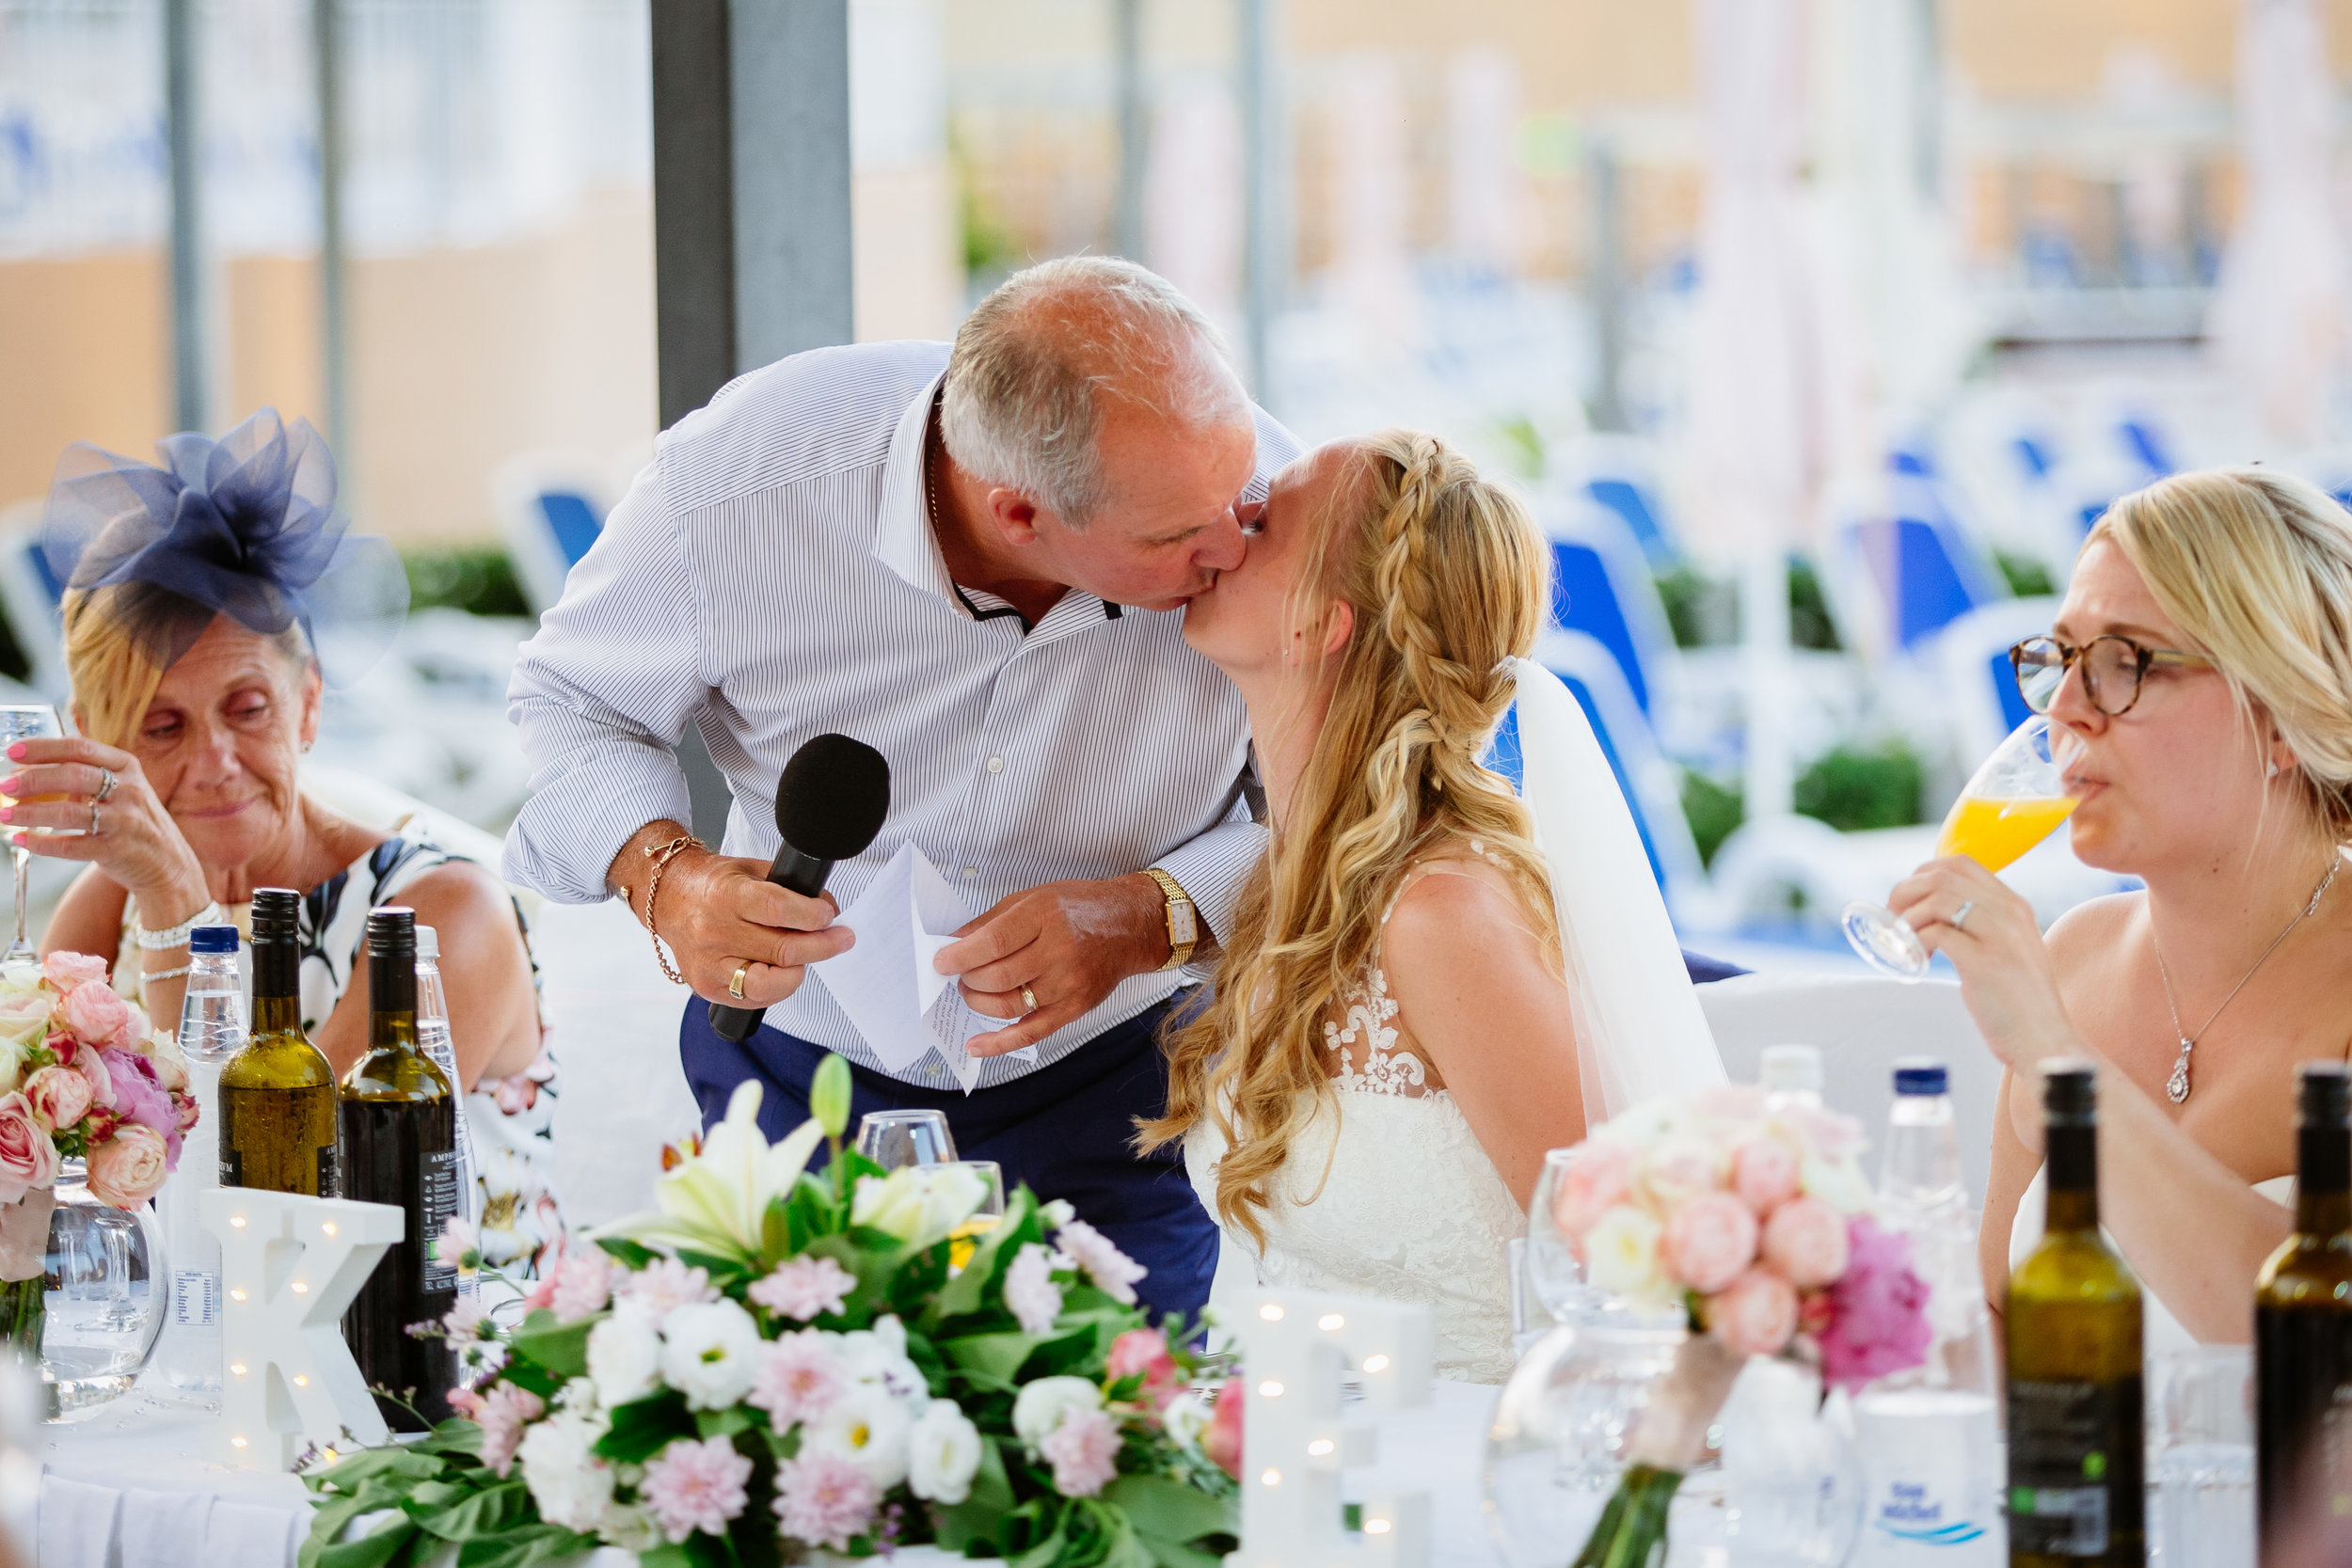 Malta_wedding_photography-94.jpg